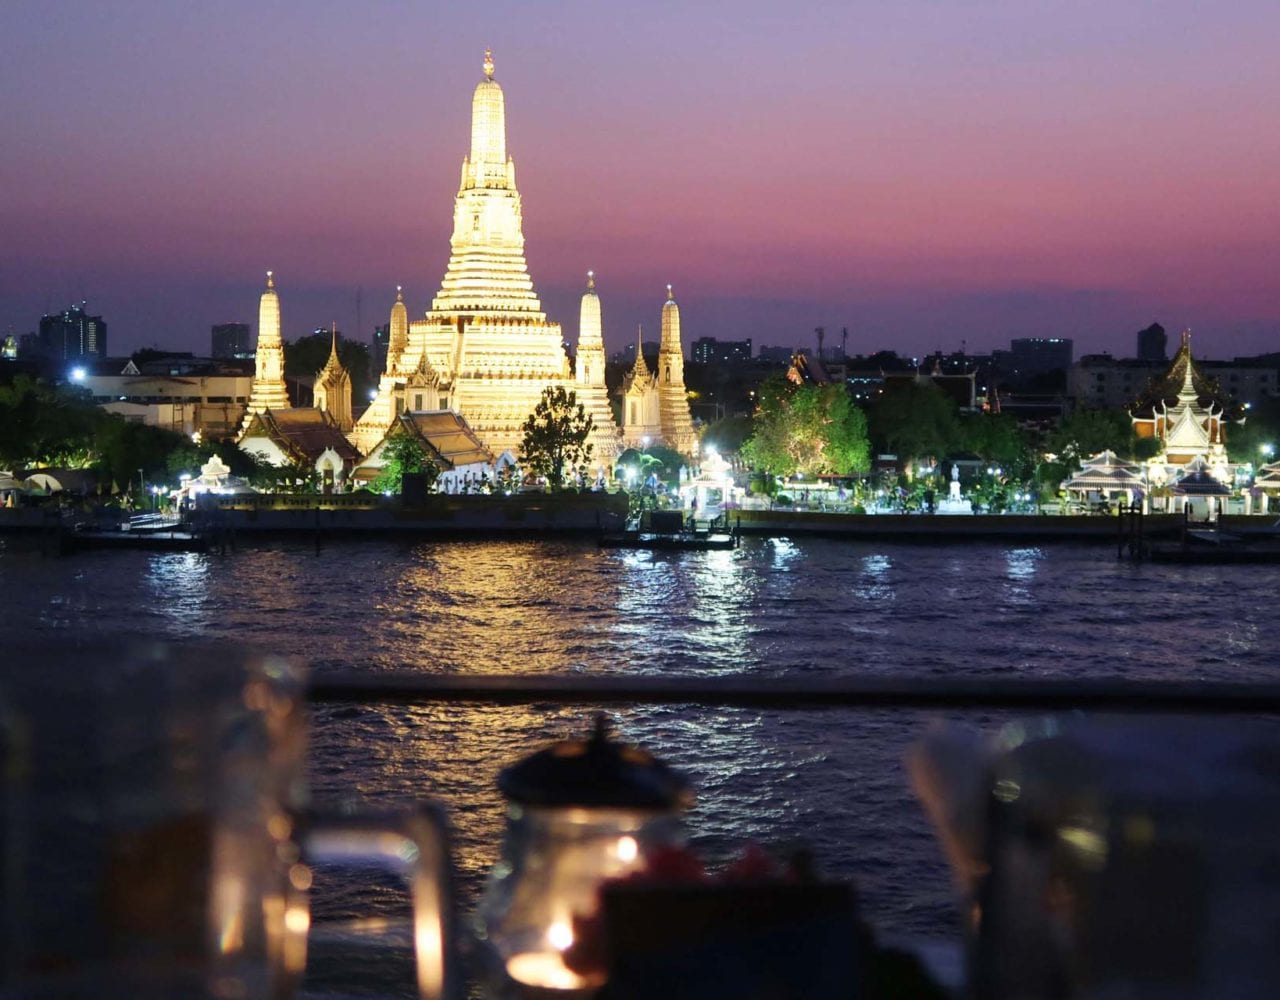 Wat Arun beleuchtet vor pinkem Himmel